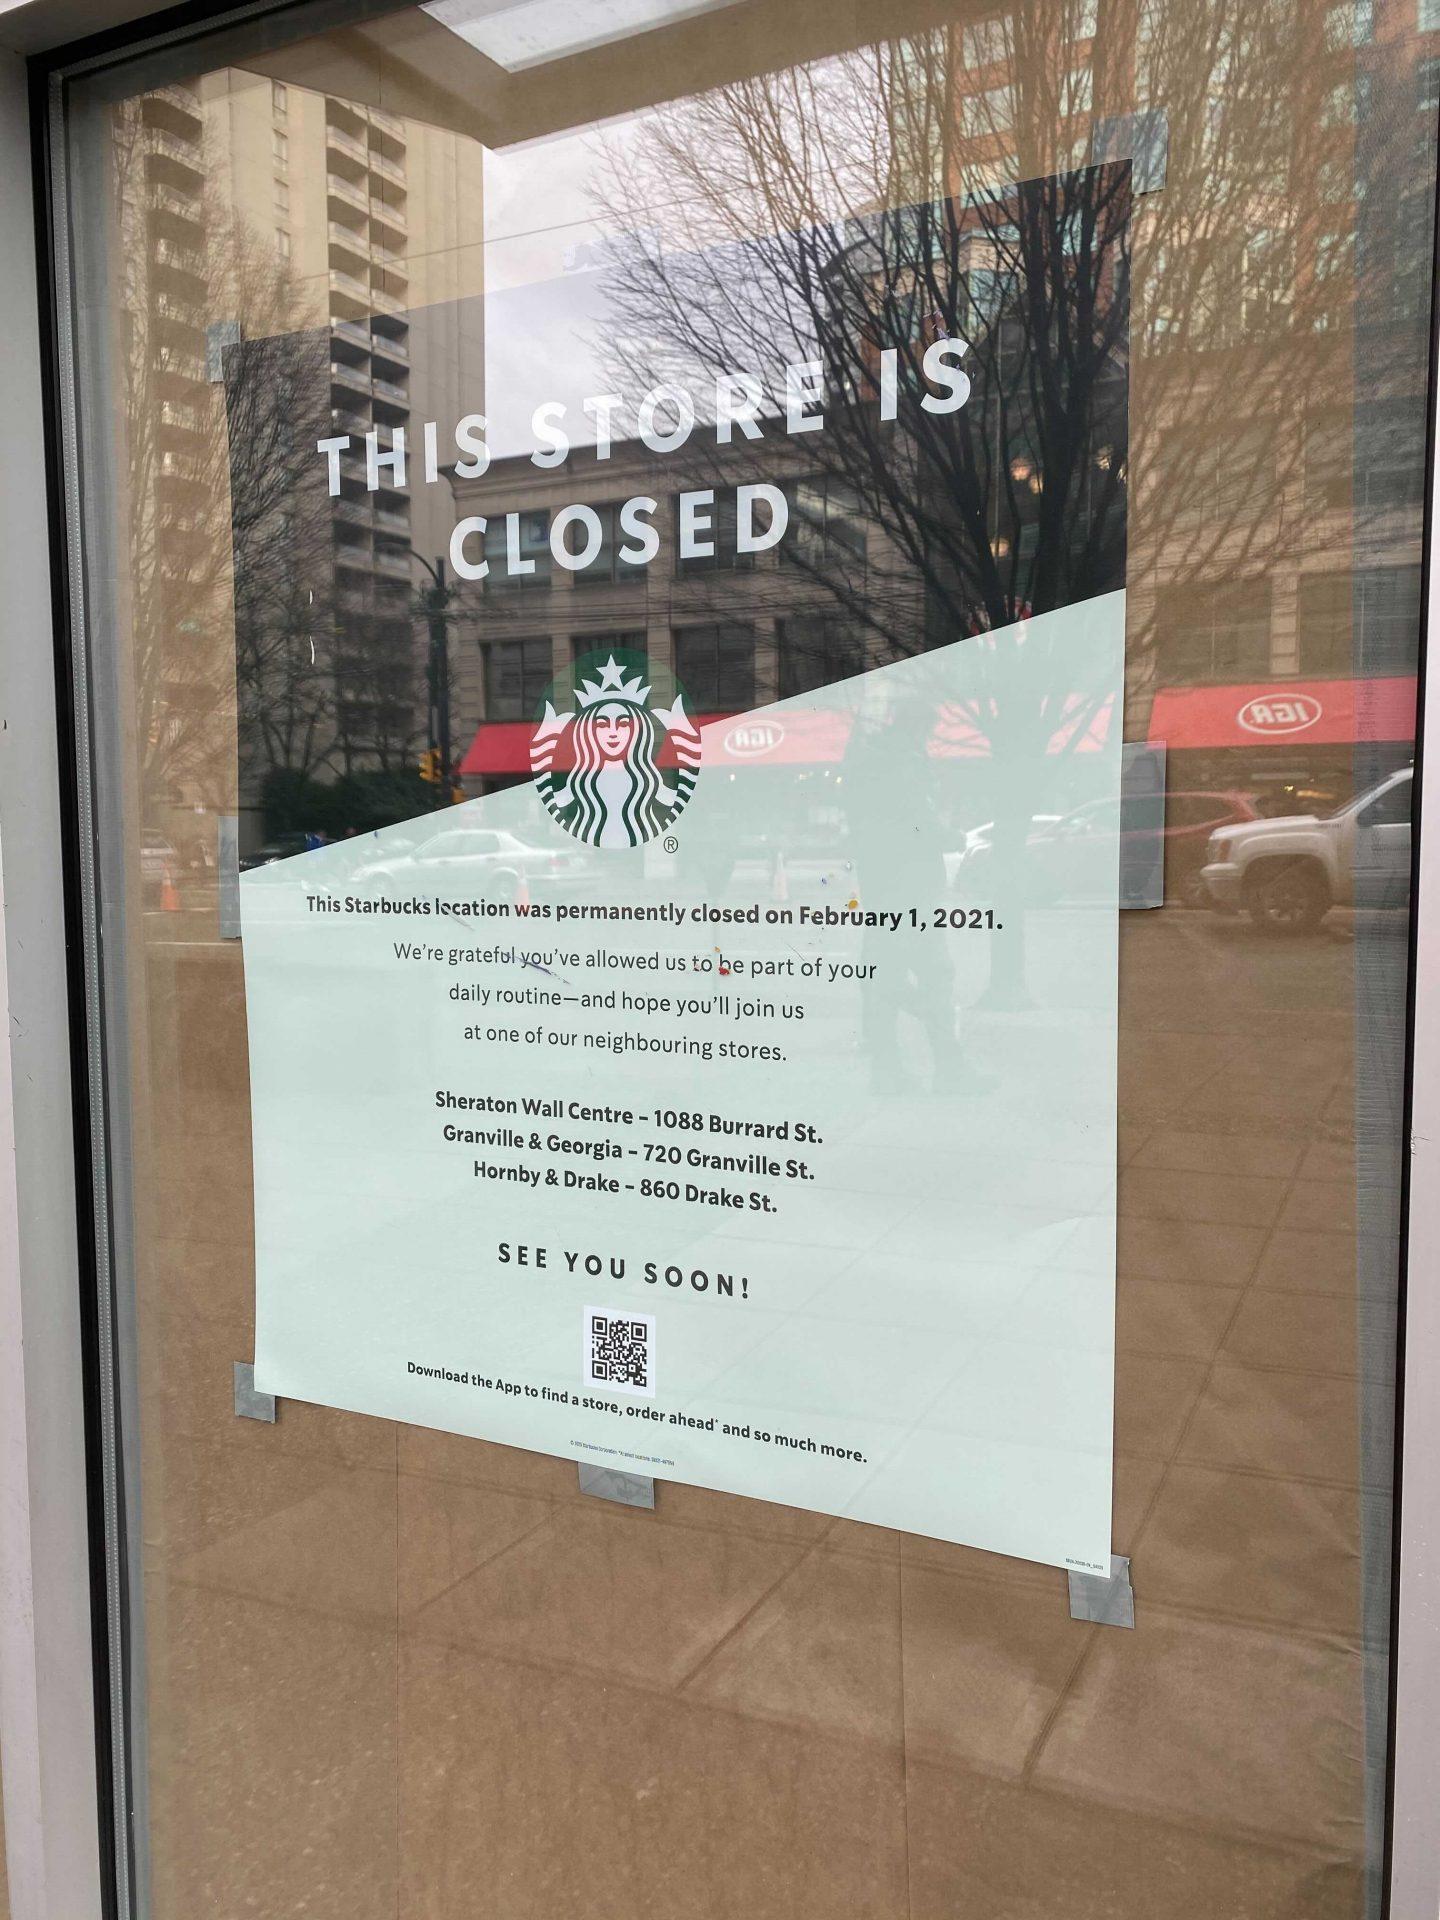 Starbucks closed